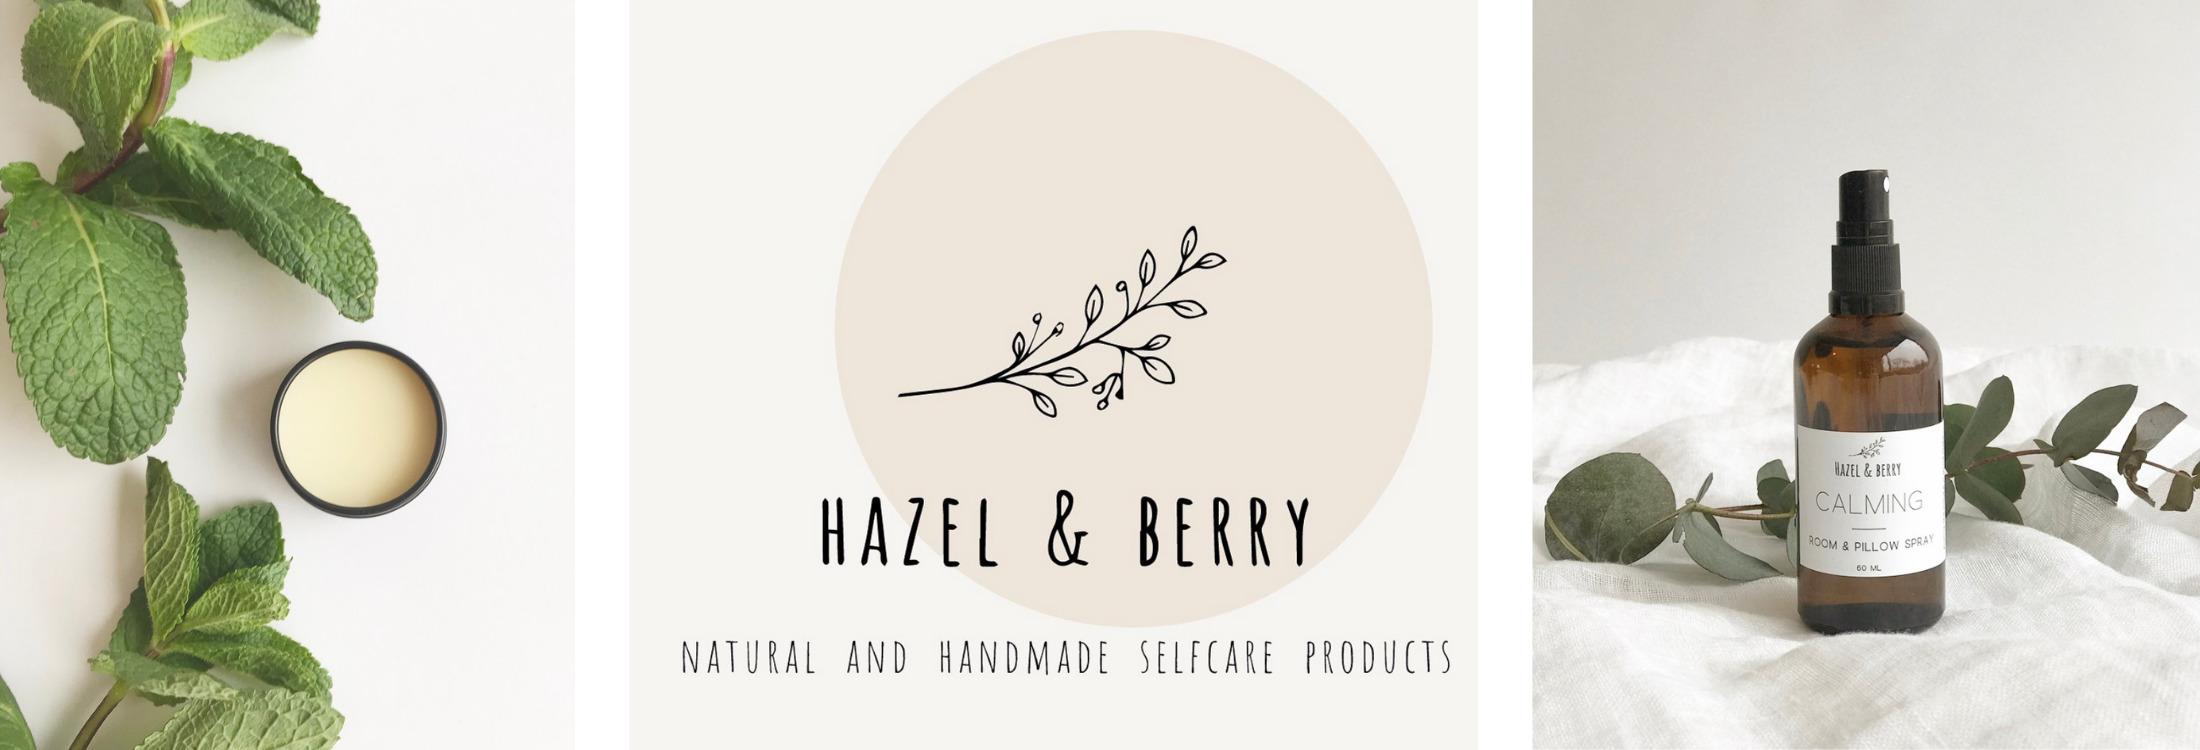 Hazel & Berry